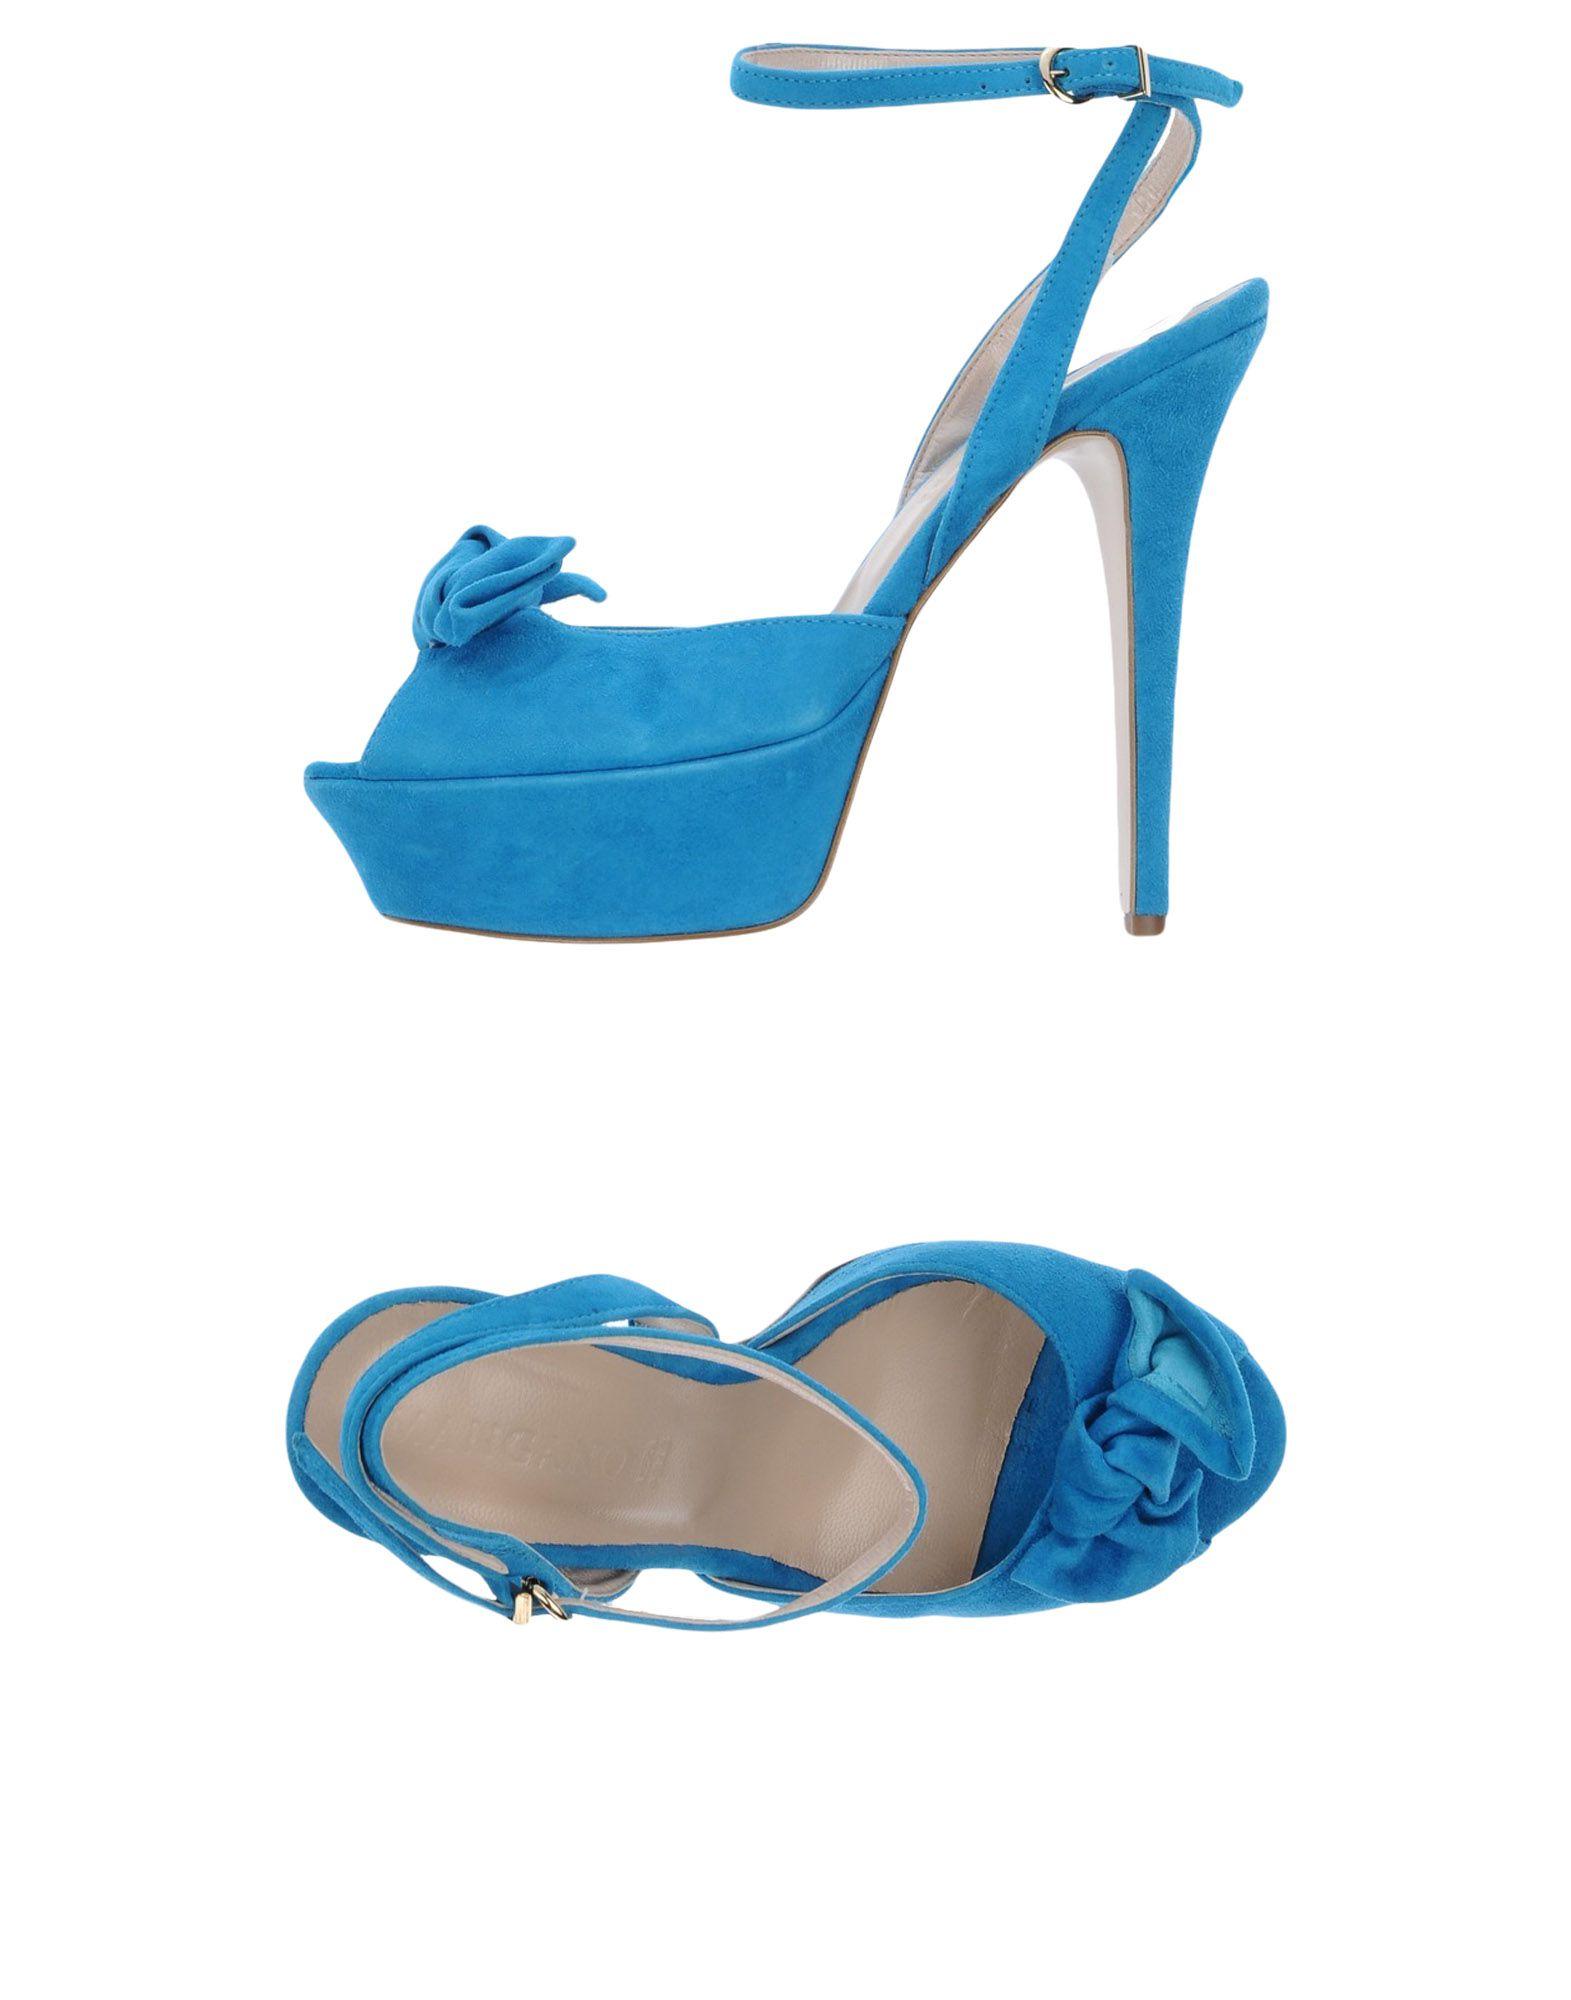 Sandali Mangano Donna - 11452293GO elegante elegante 11452293GO f4128c